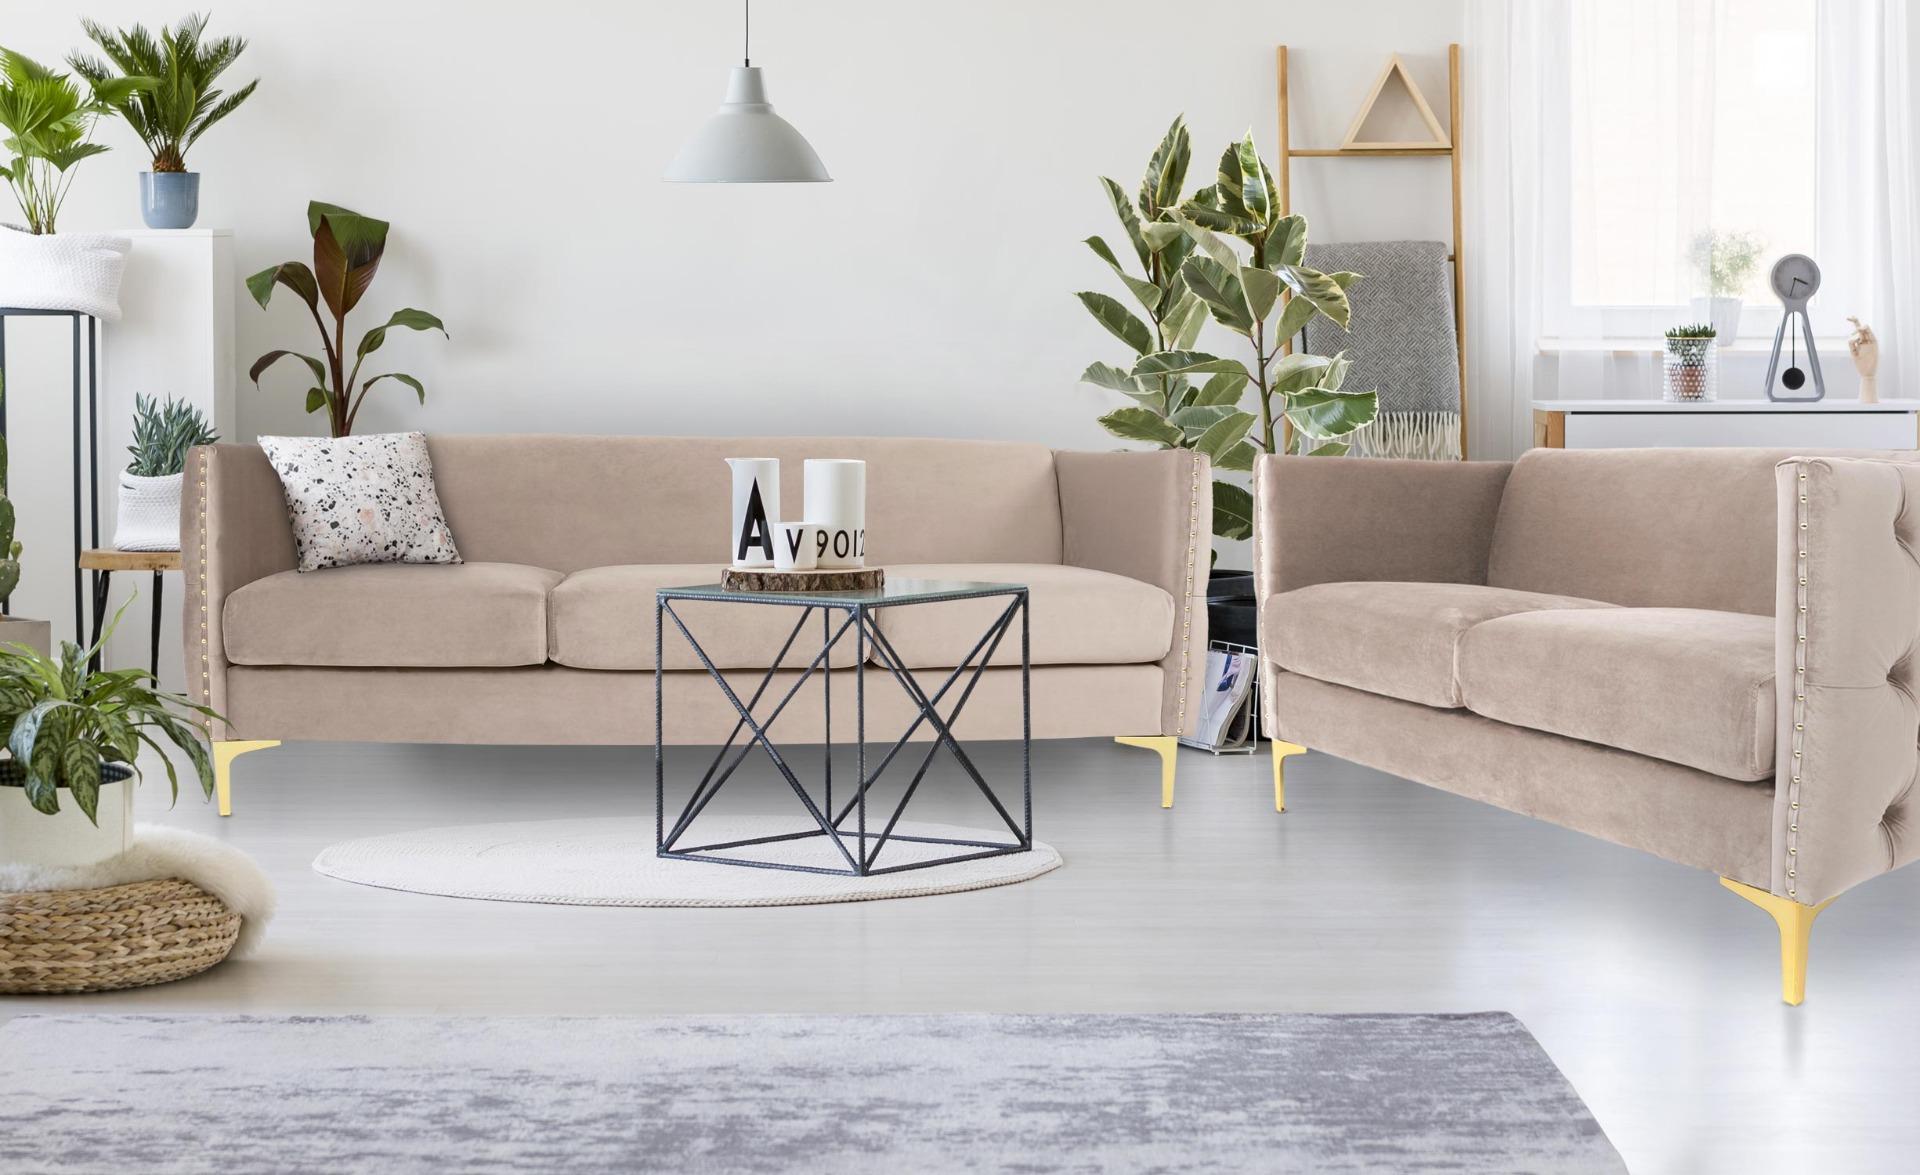 Joshua 2-Sitzer Sofa mit Samtbezug Taupe